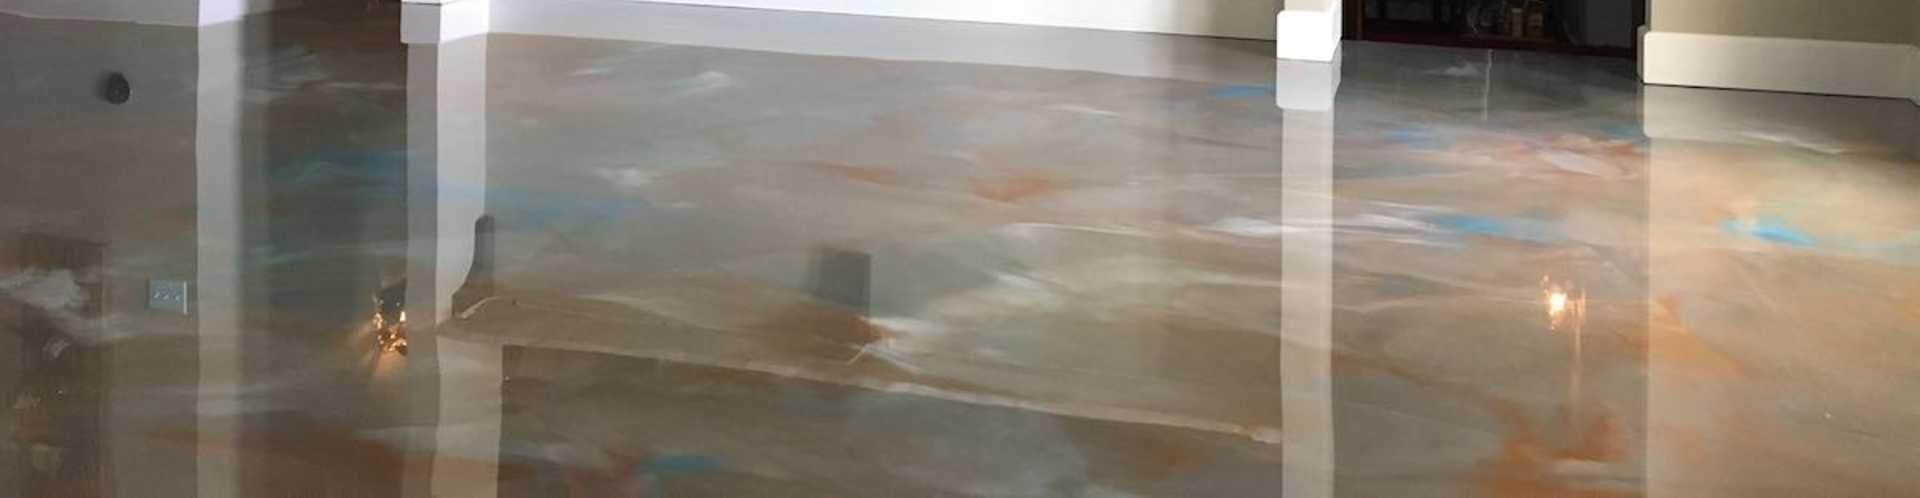 Finished Basement Floor | Basement Floor Ideas